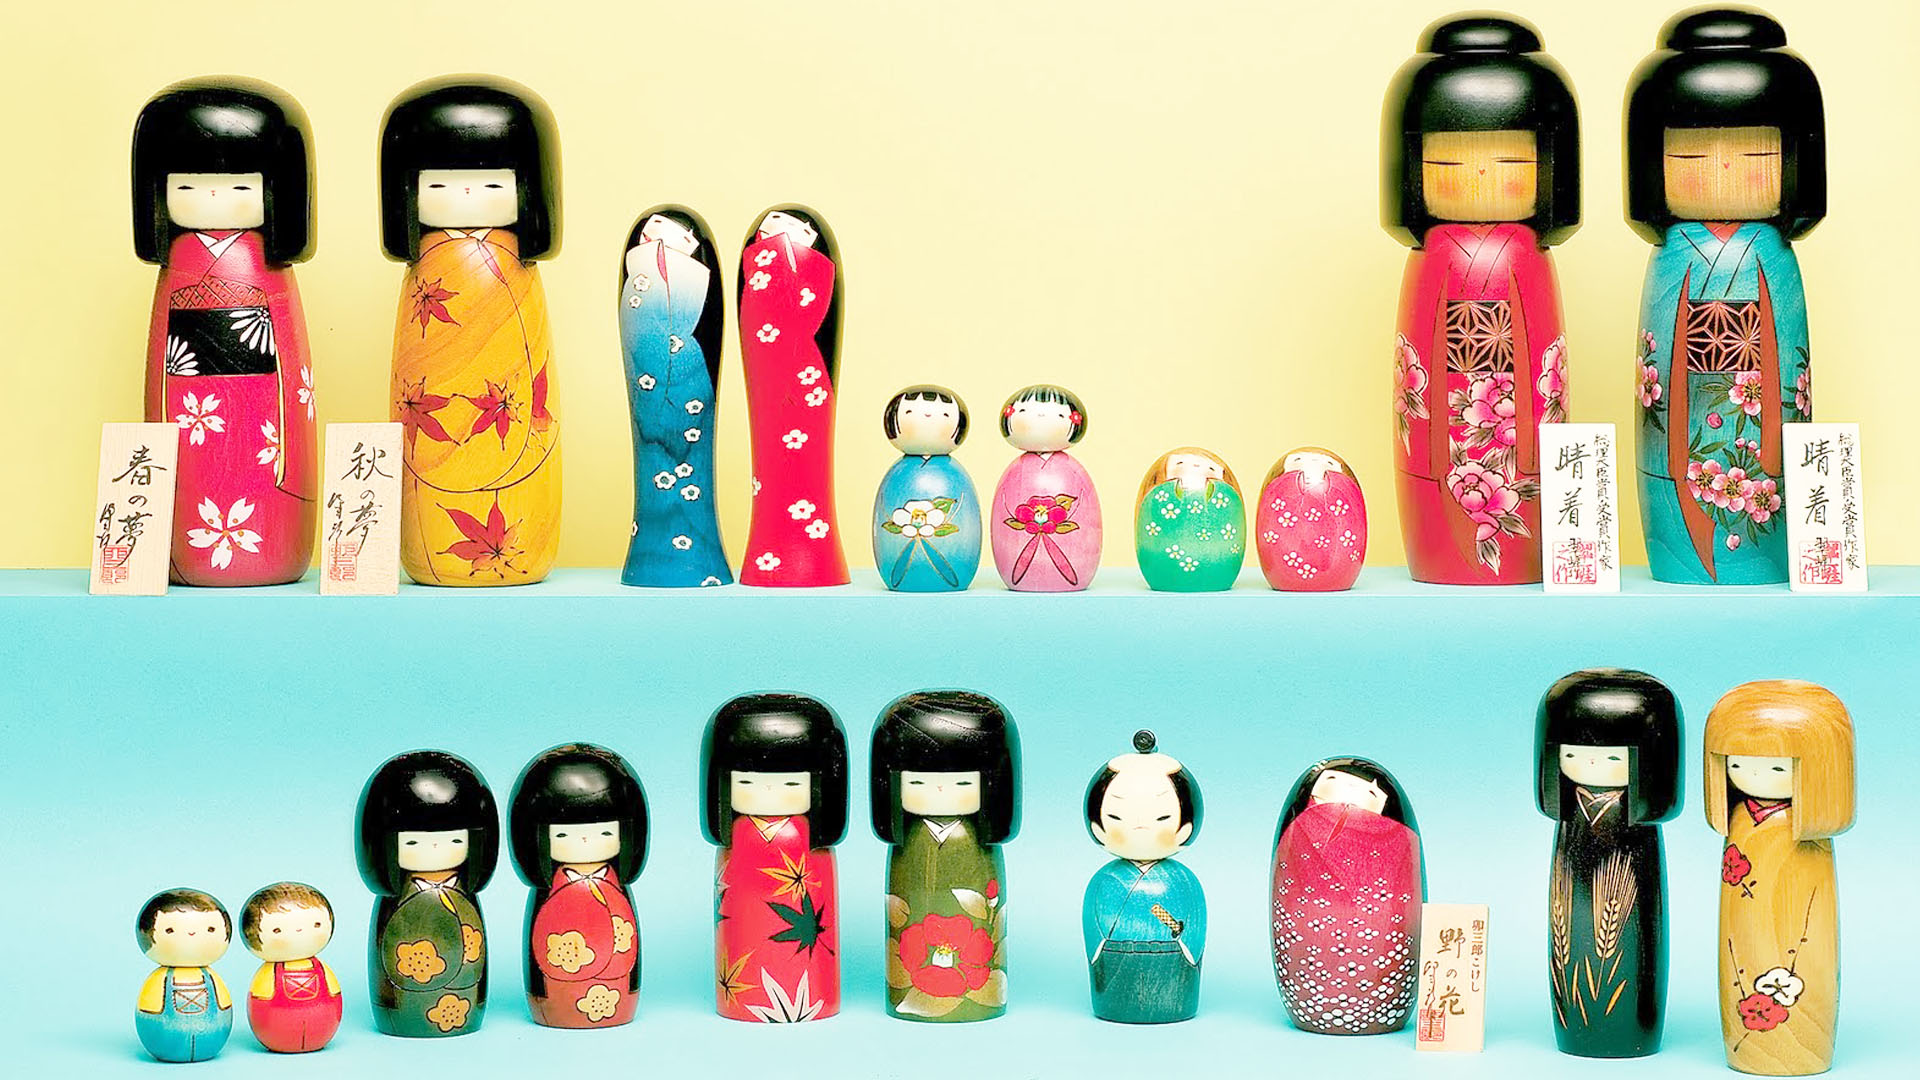 Artigianato giapponese Kokeshi: shop online dal Giappone